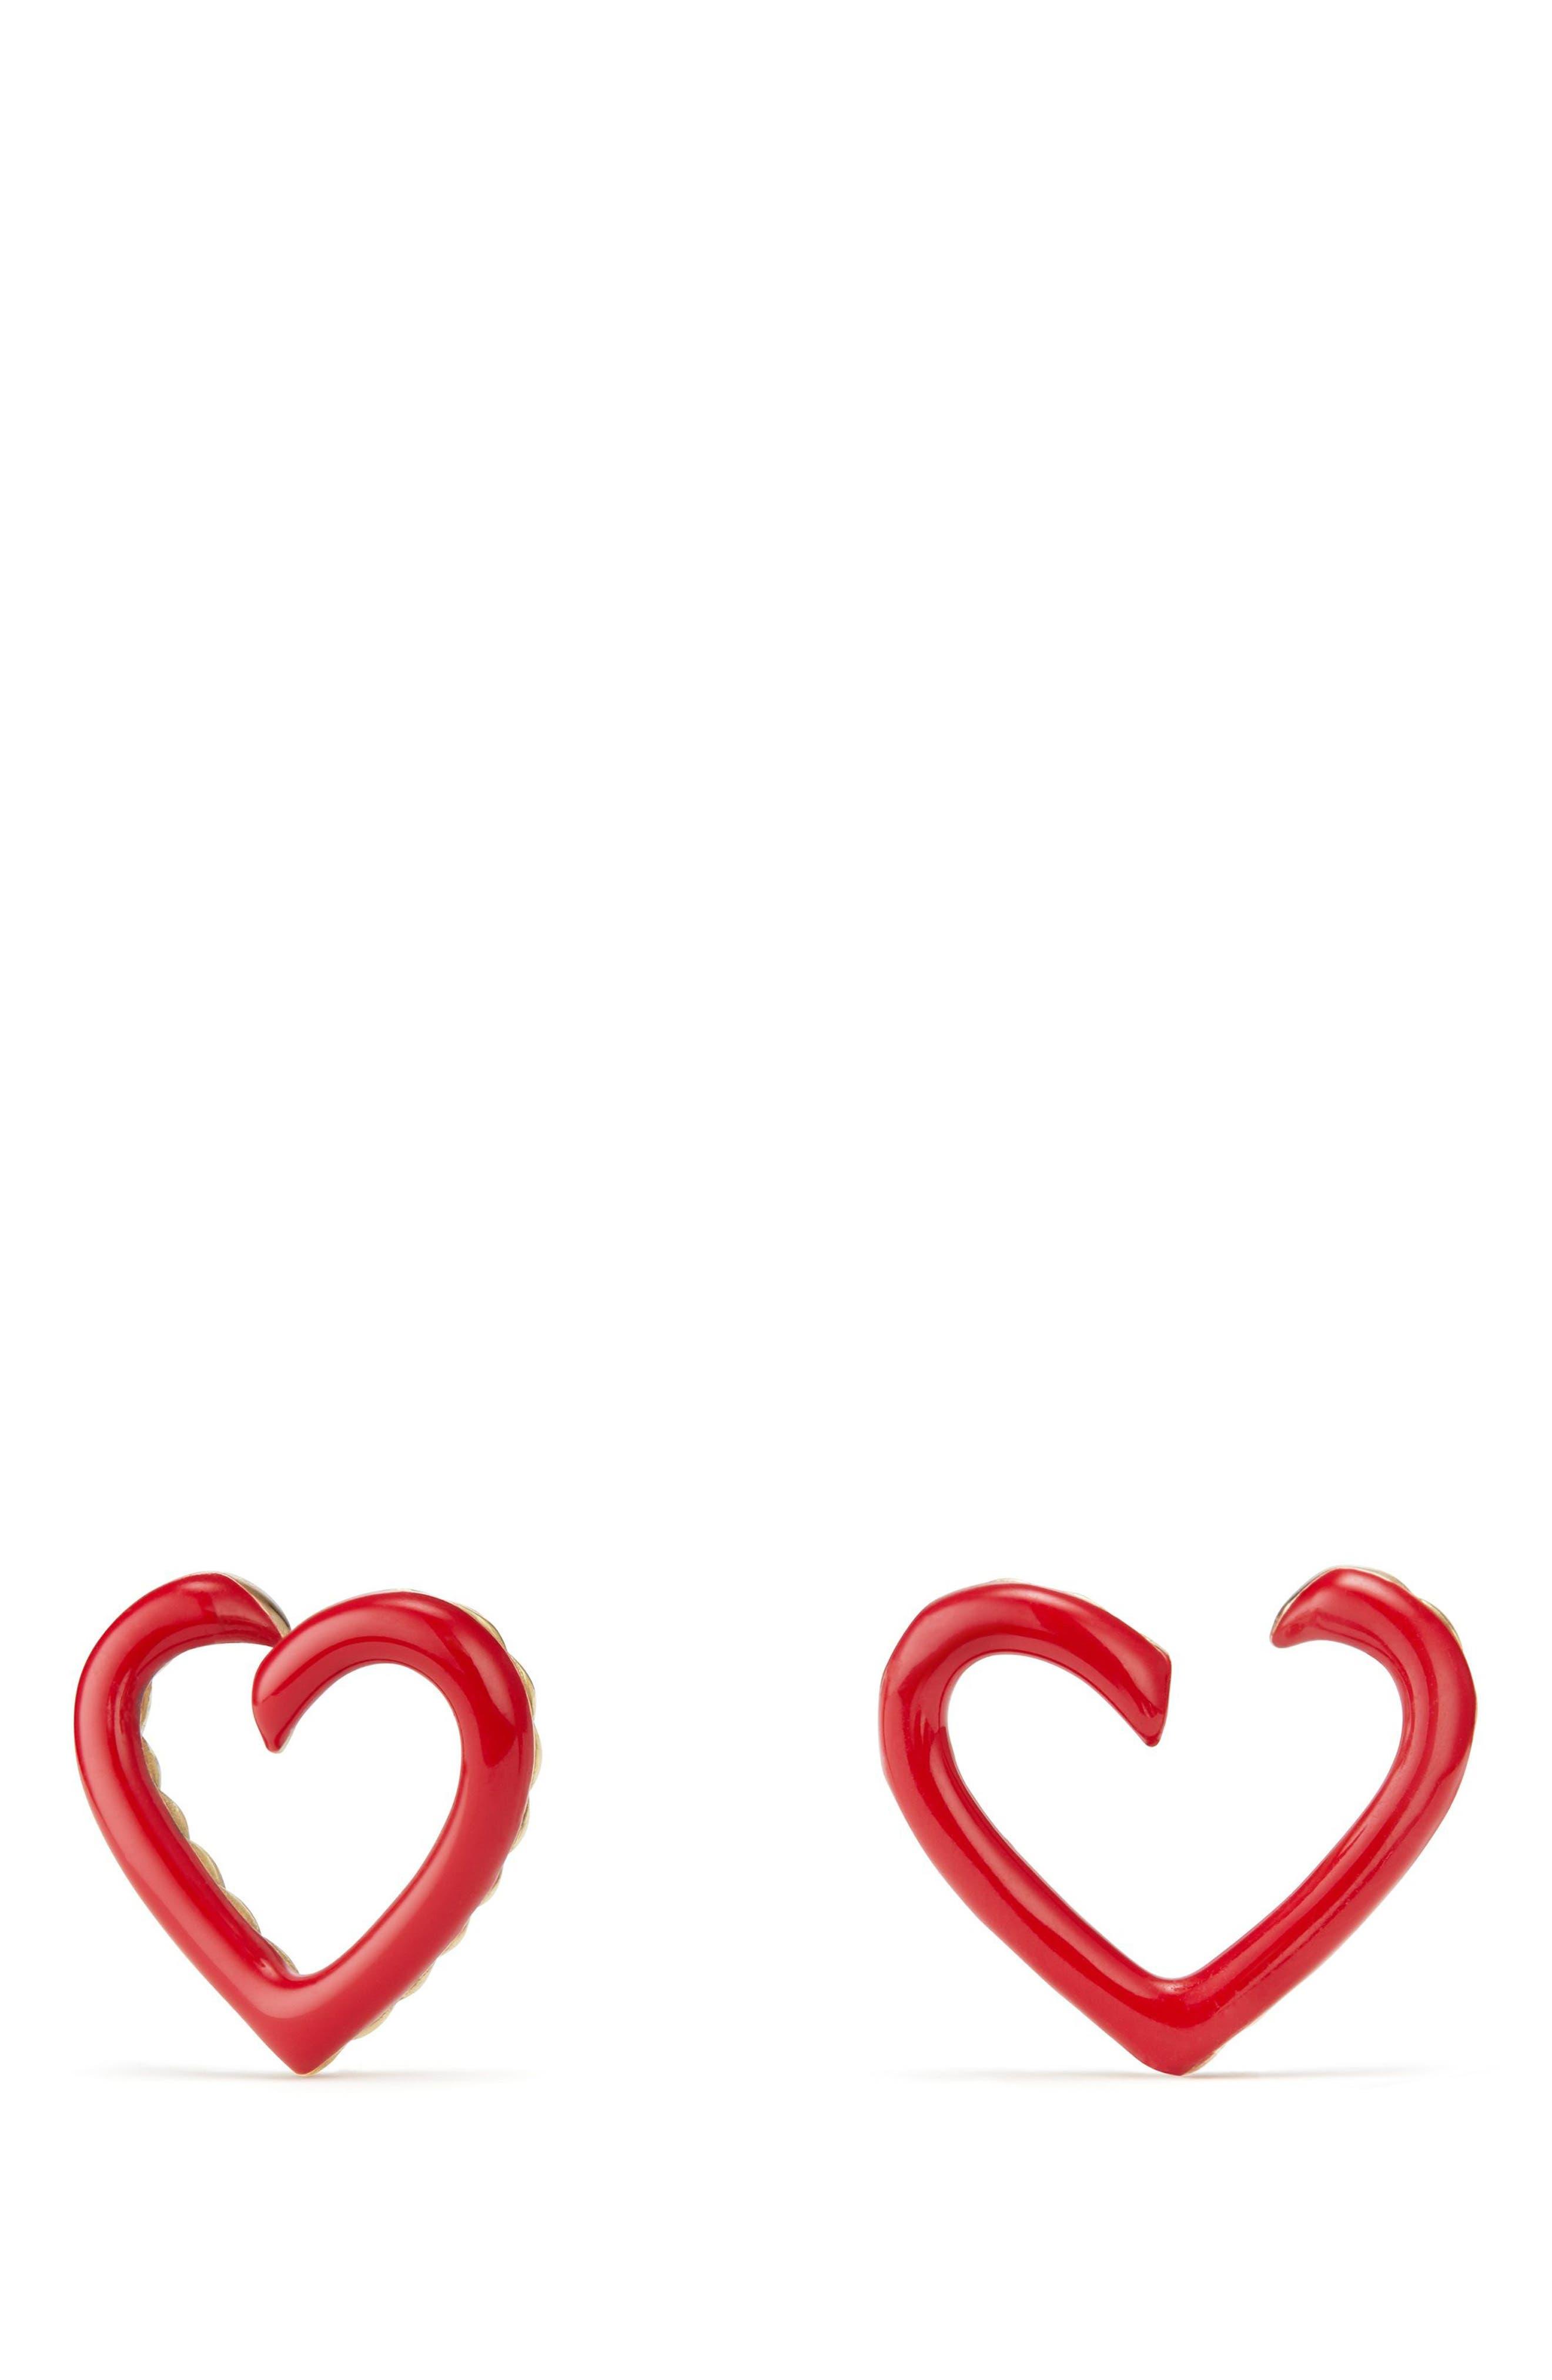 David Yurman Cable Heart Earrings in Red Enamel and 18K Gold